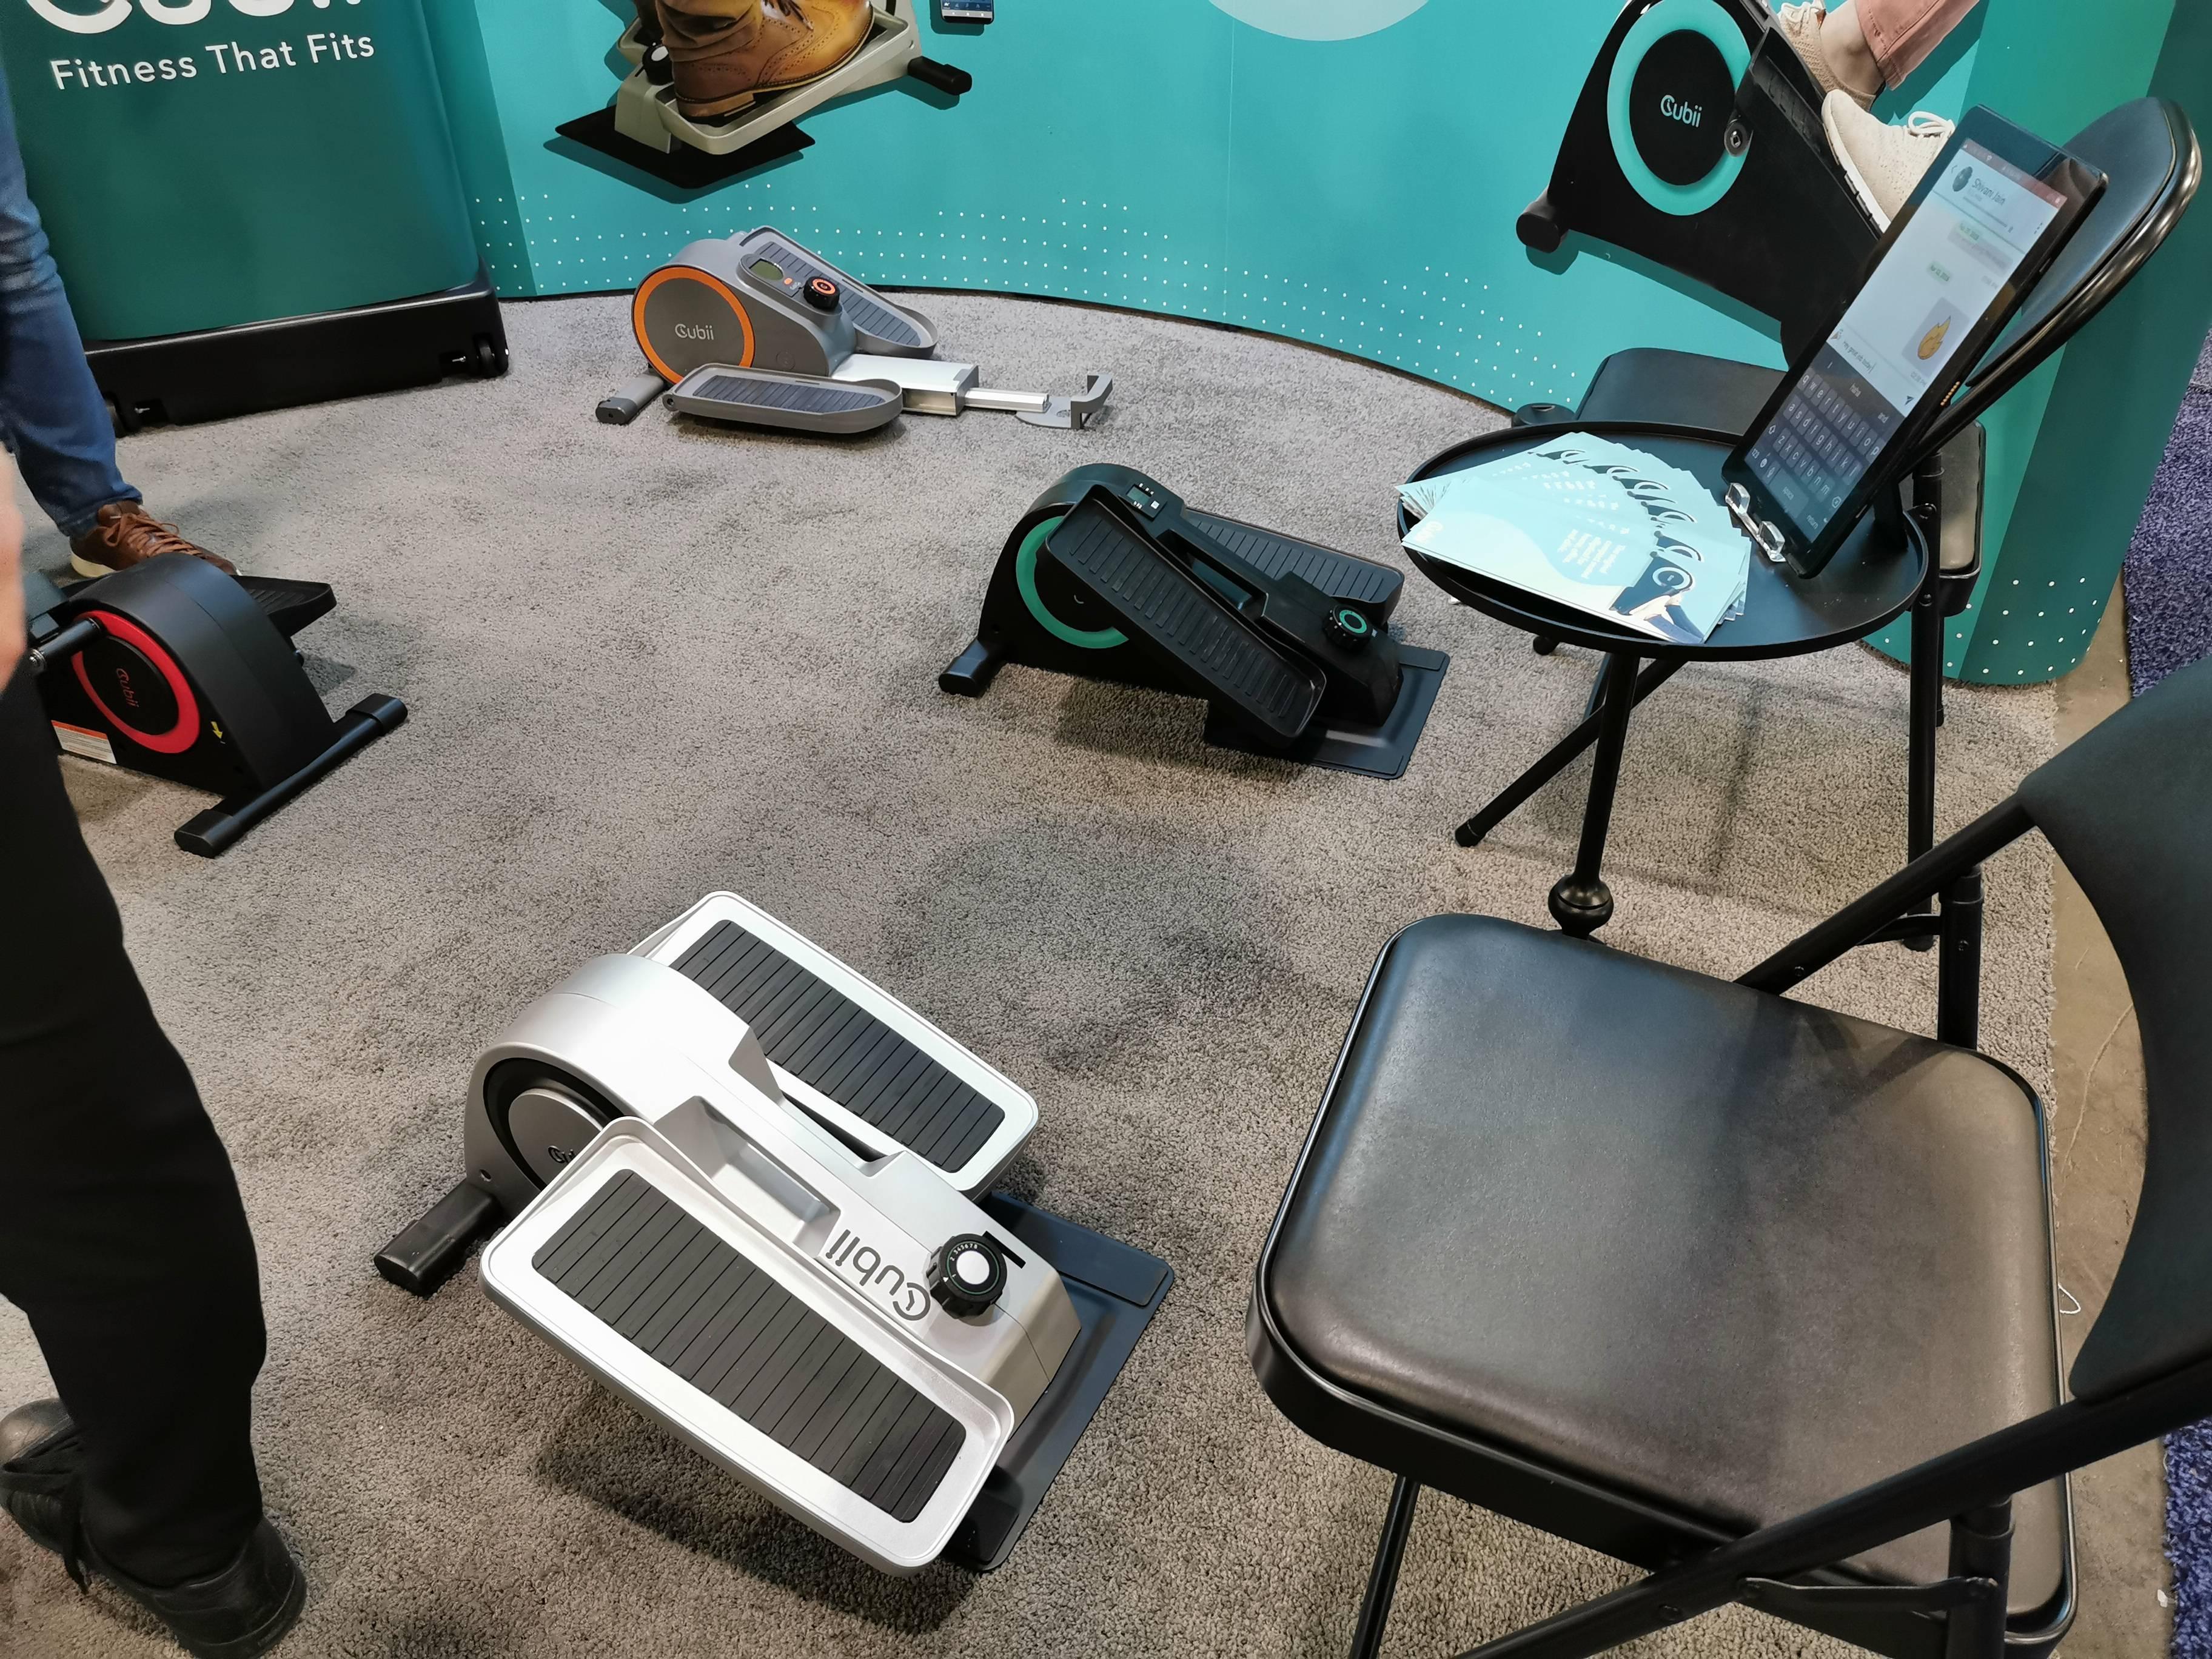 Oficinas: Bicicleta elíptica para piernas te ayuda a ejercitar cuando estas sentado #CES2020